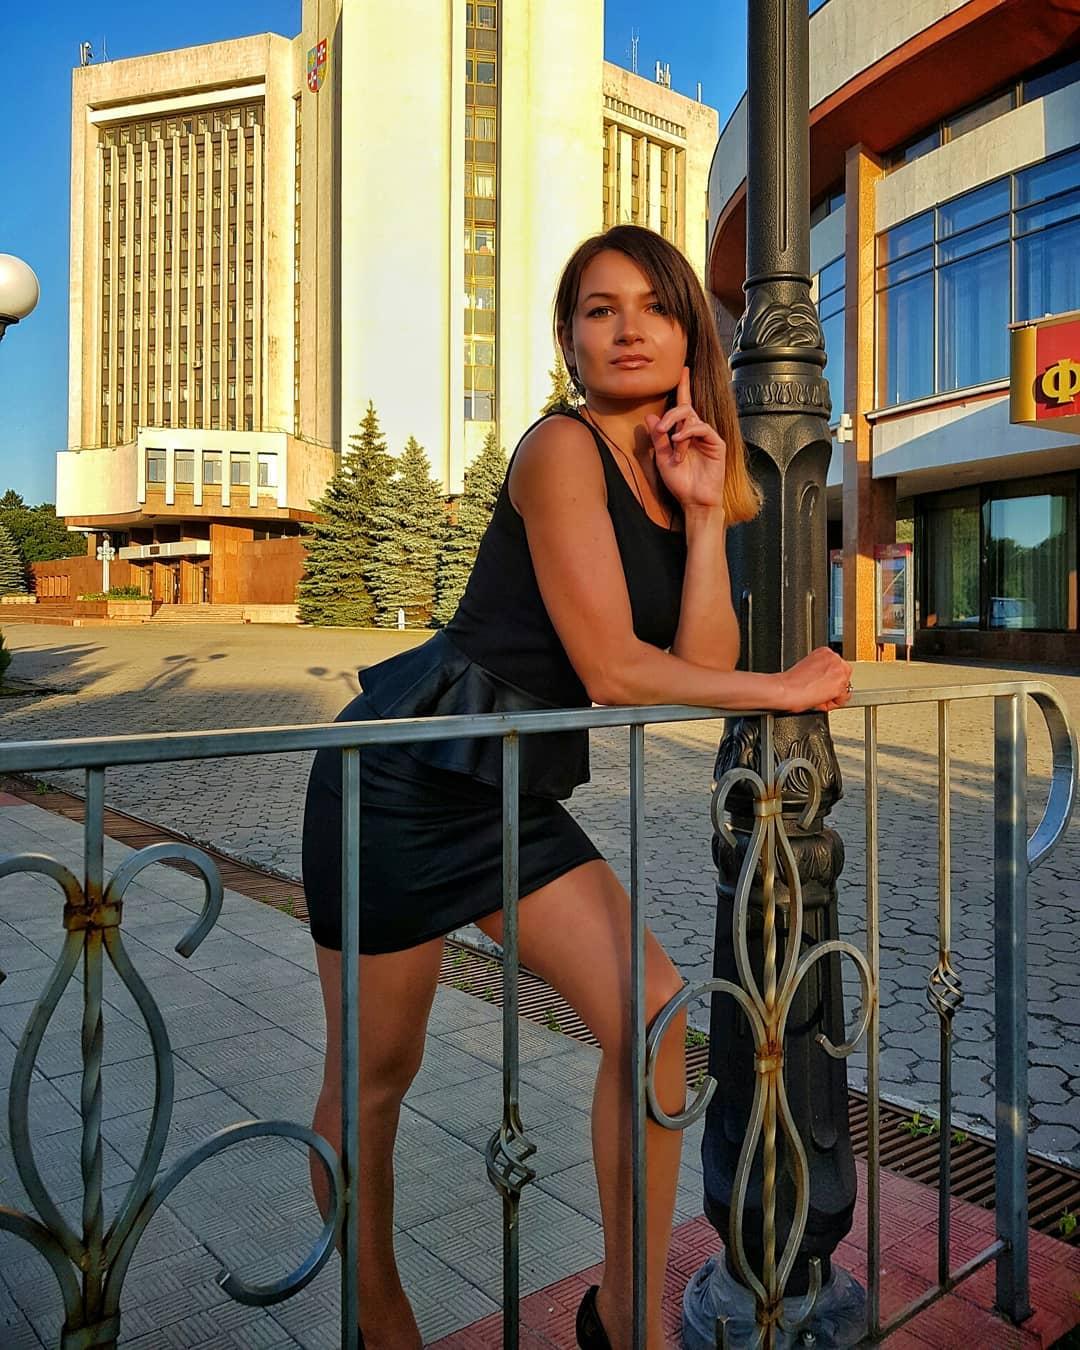 Olga-Madych-Wallpapers-Insta-Fit-Bio-13